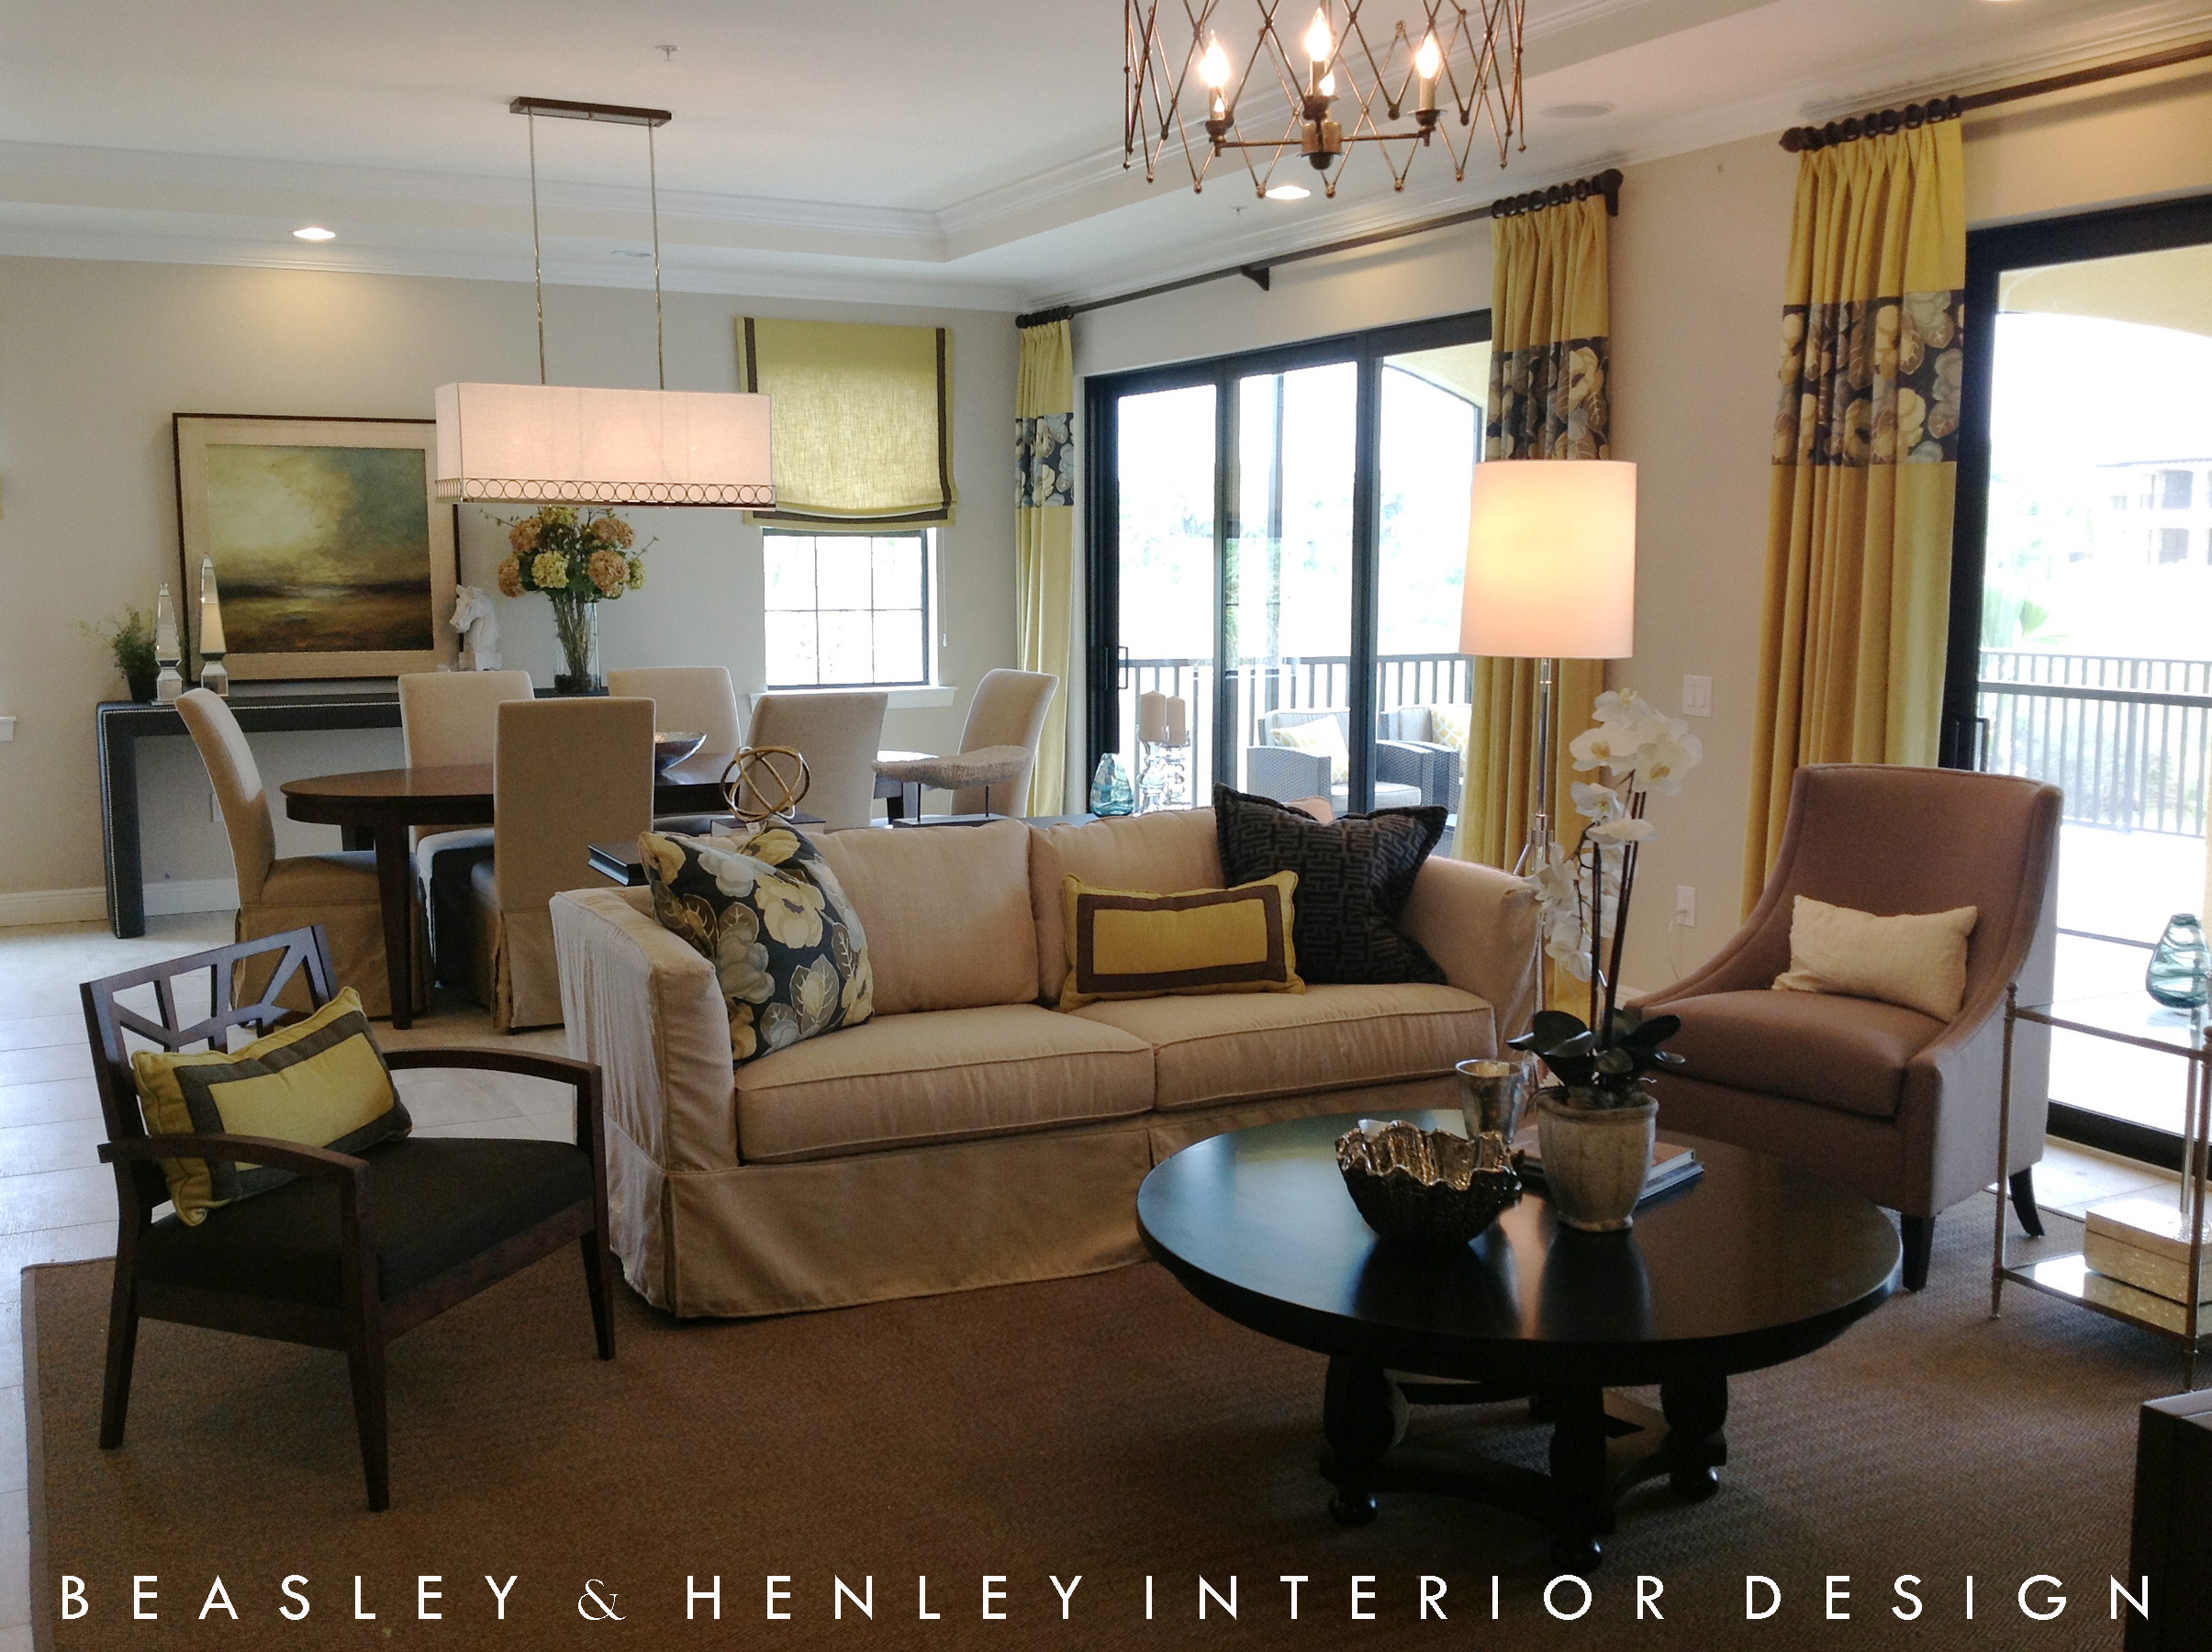 Beasley henley interior design wci communities install for Interior design room names